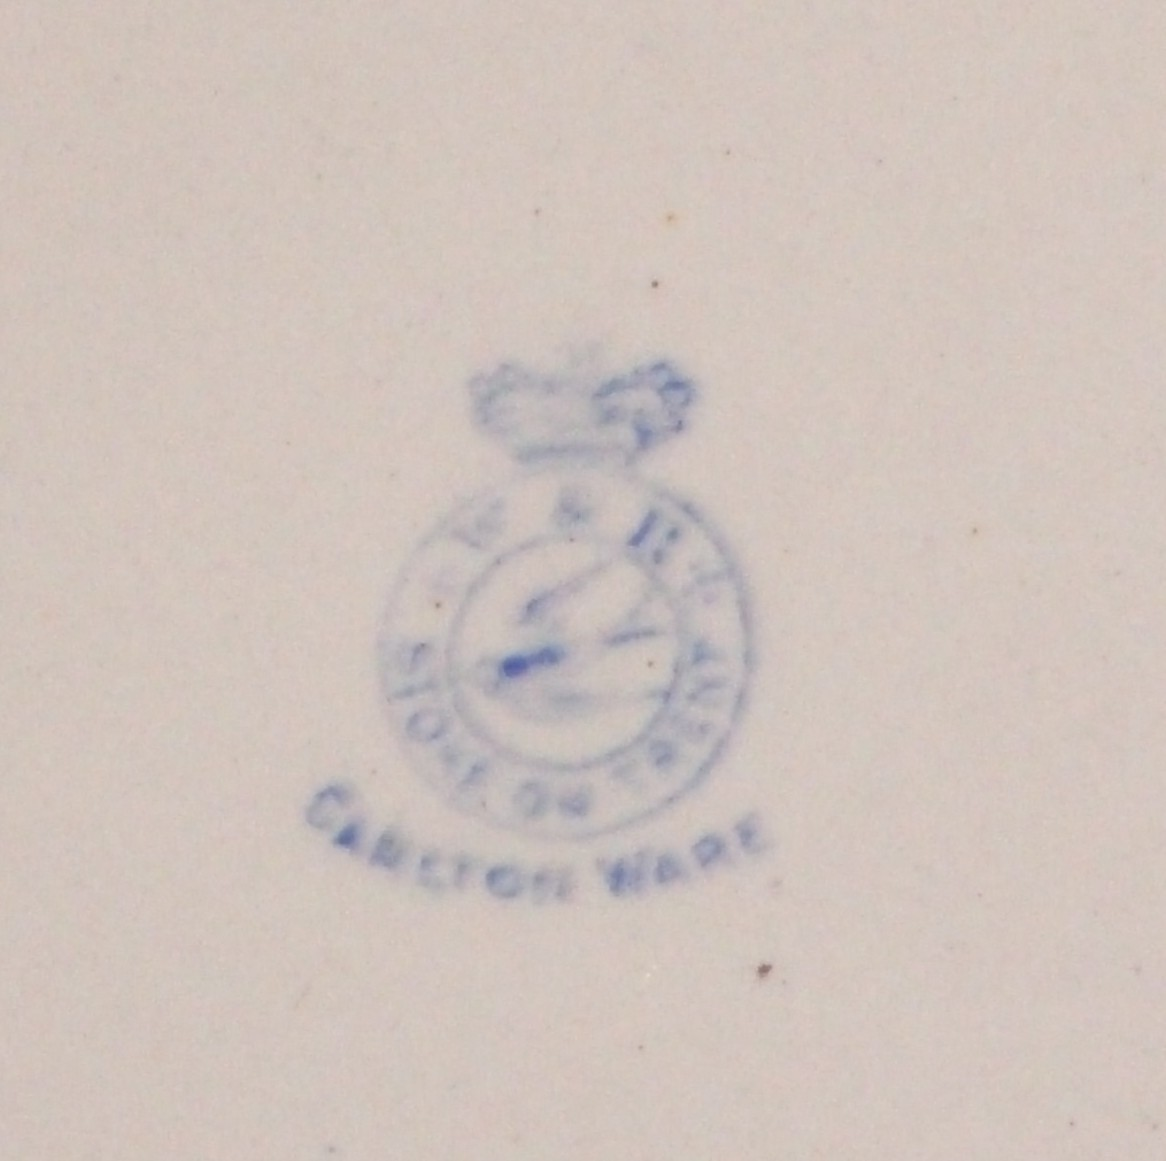 c 1894 Carlton Ware  Wiltshaw + Robinson BABY'S PLATE Stoke-on-Trent England